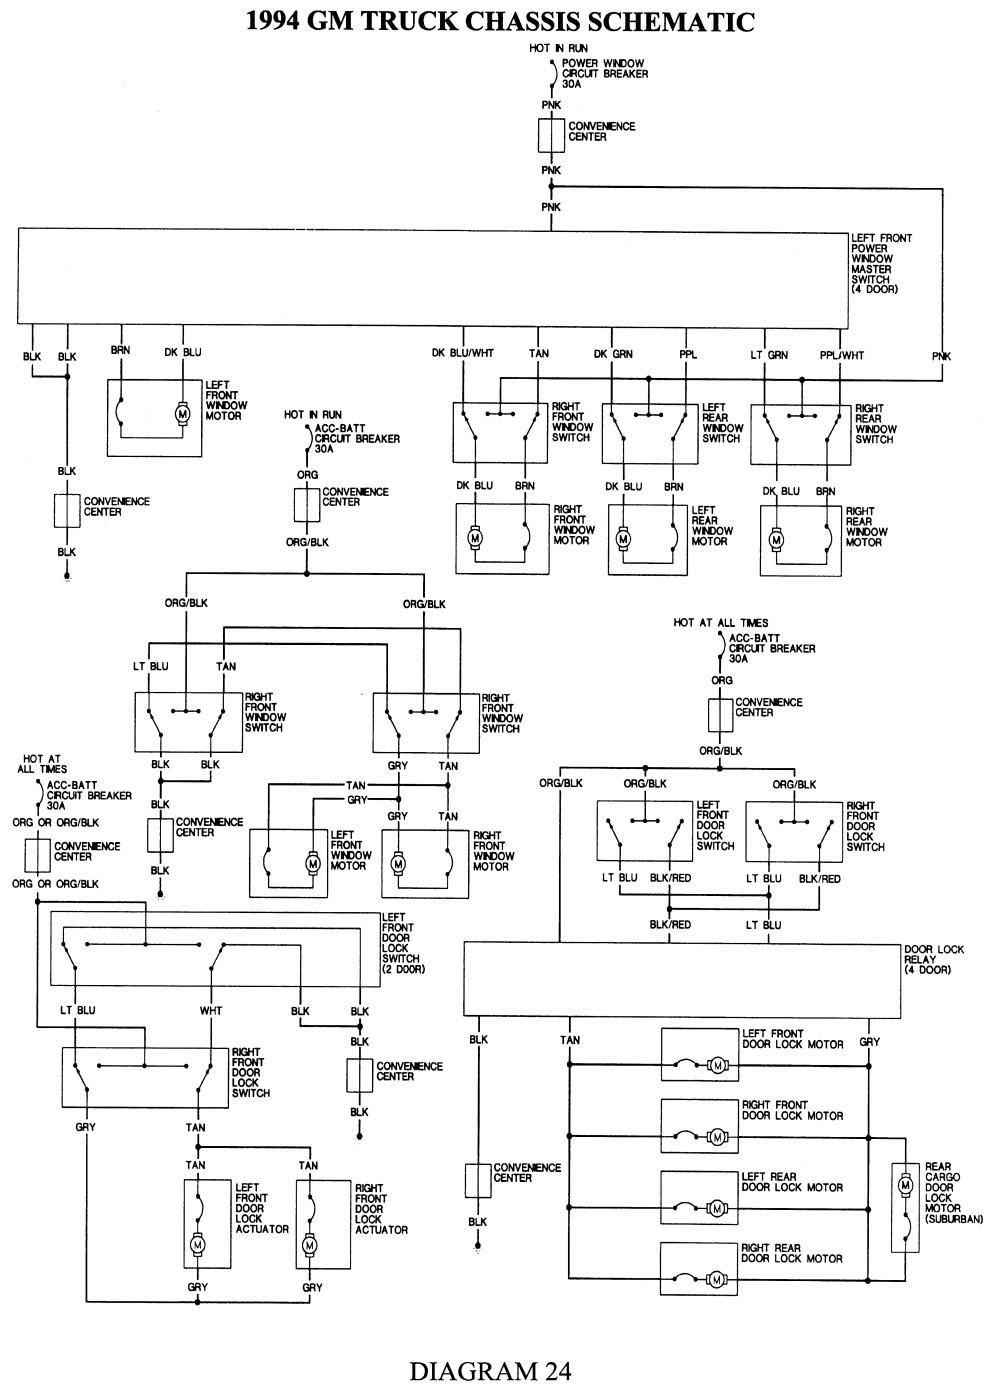 free gmc wiring diagrams 1994 - wiring diagram system database-locate-a -  database-locate-a.ediliadesign.it  ediliadesign.it